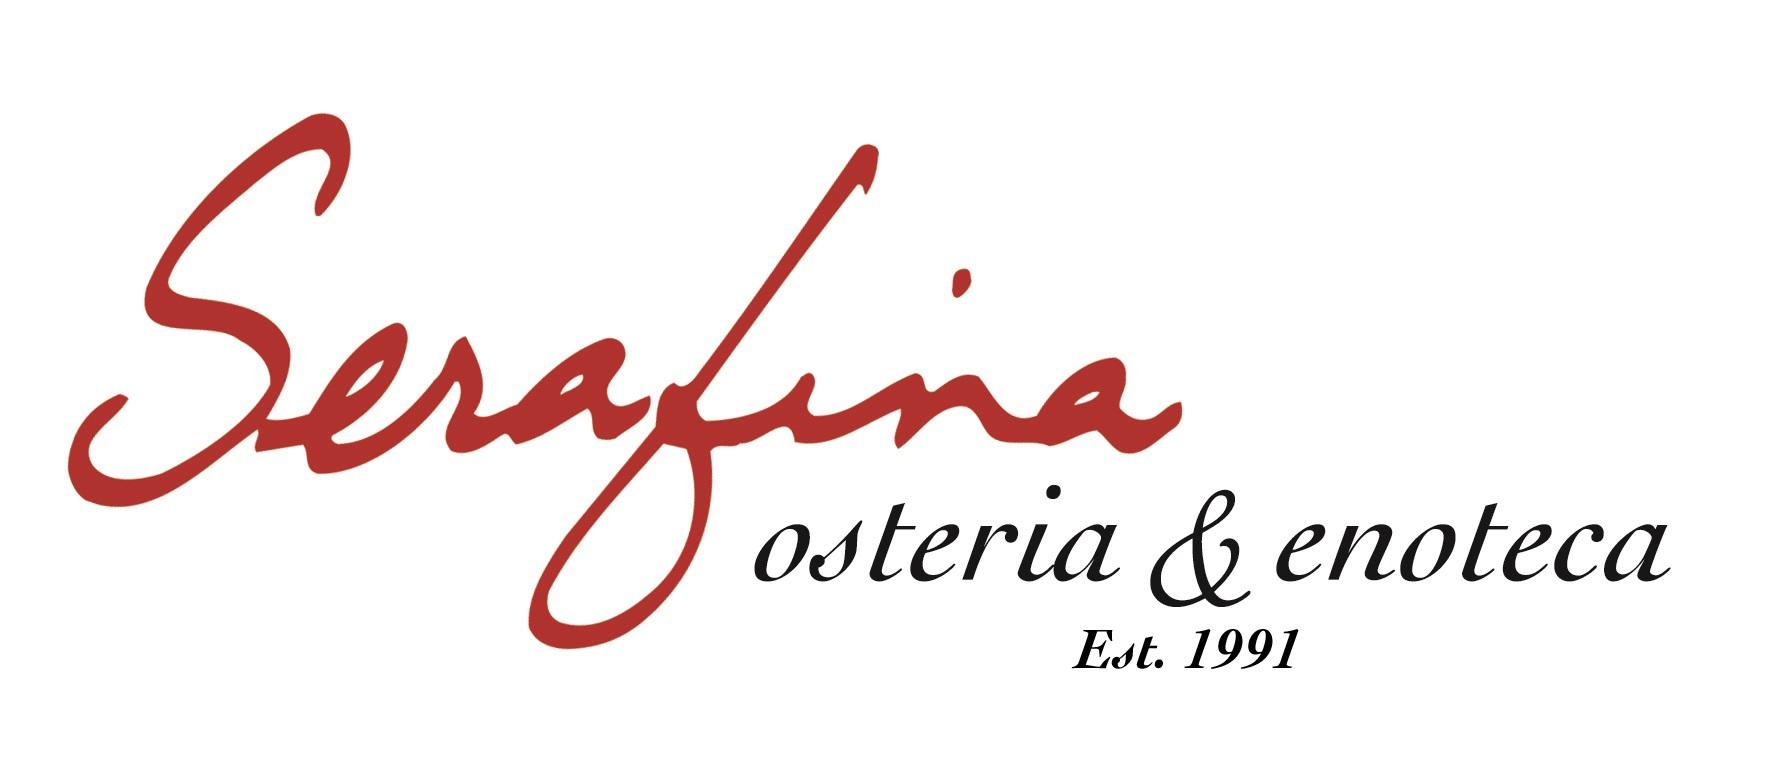 Serafina Logo